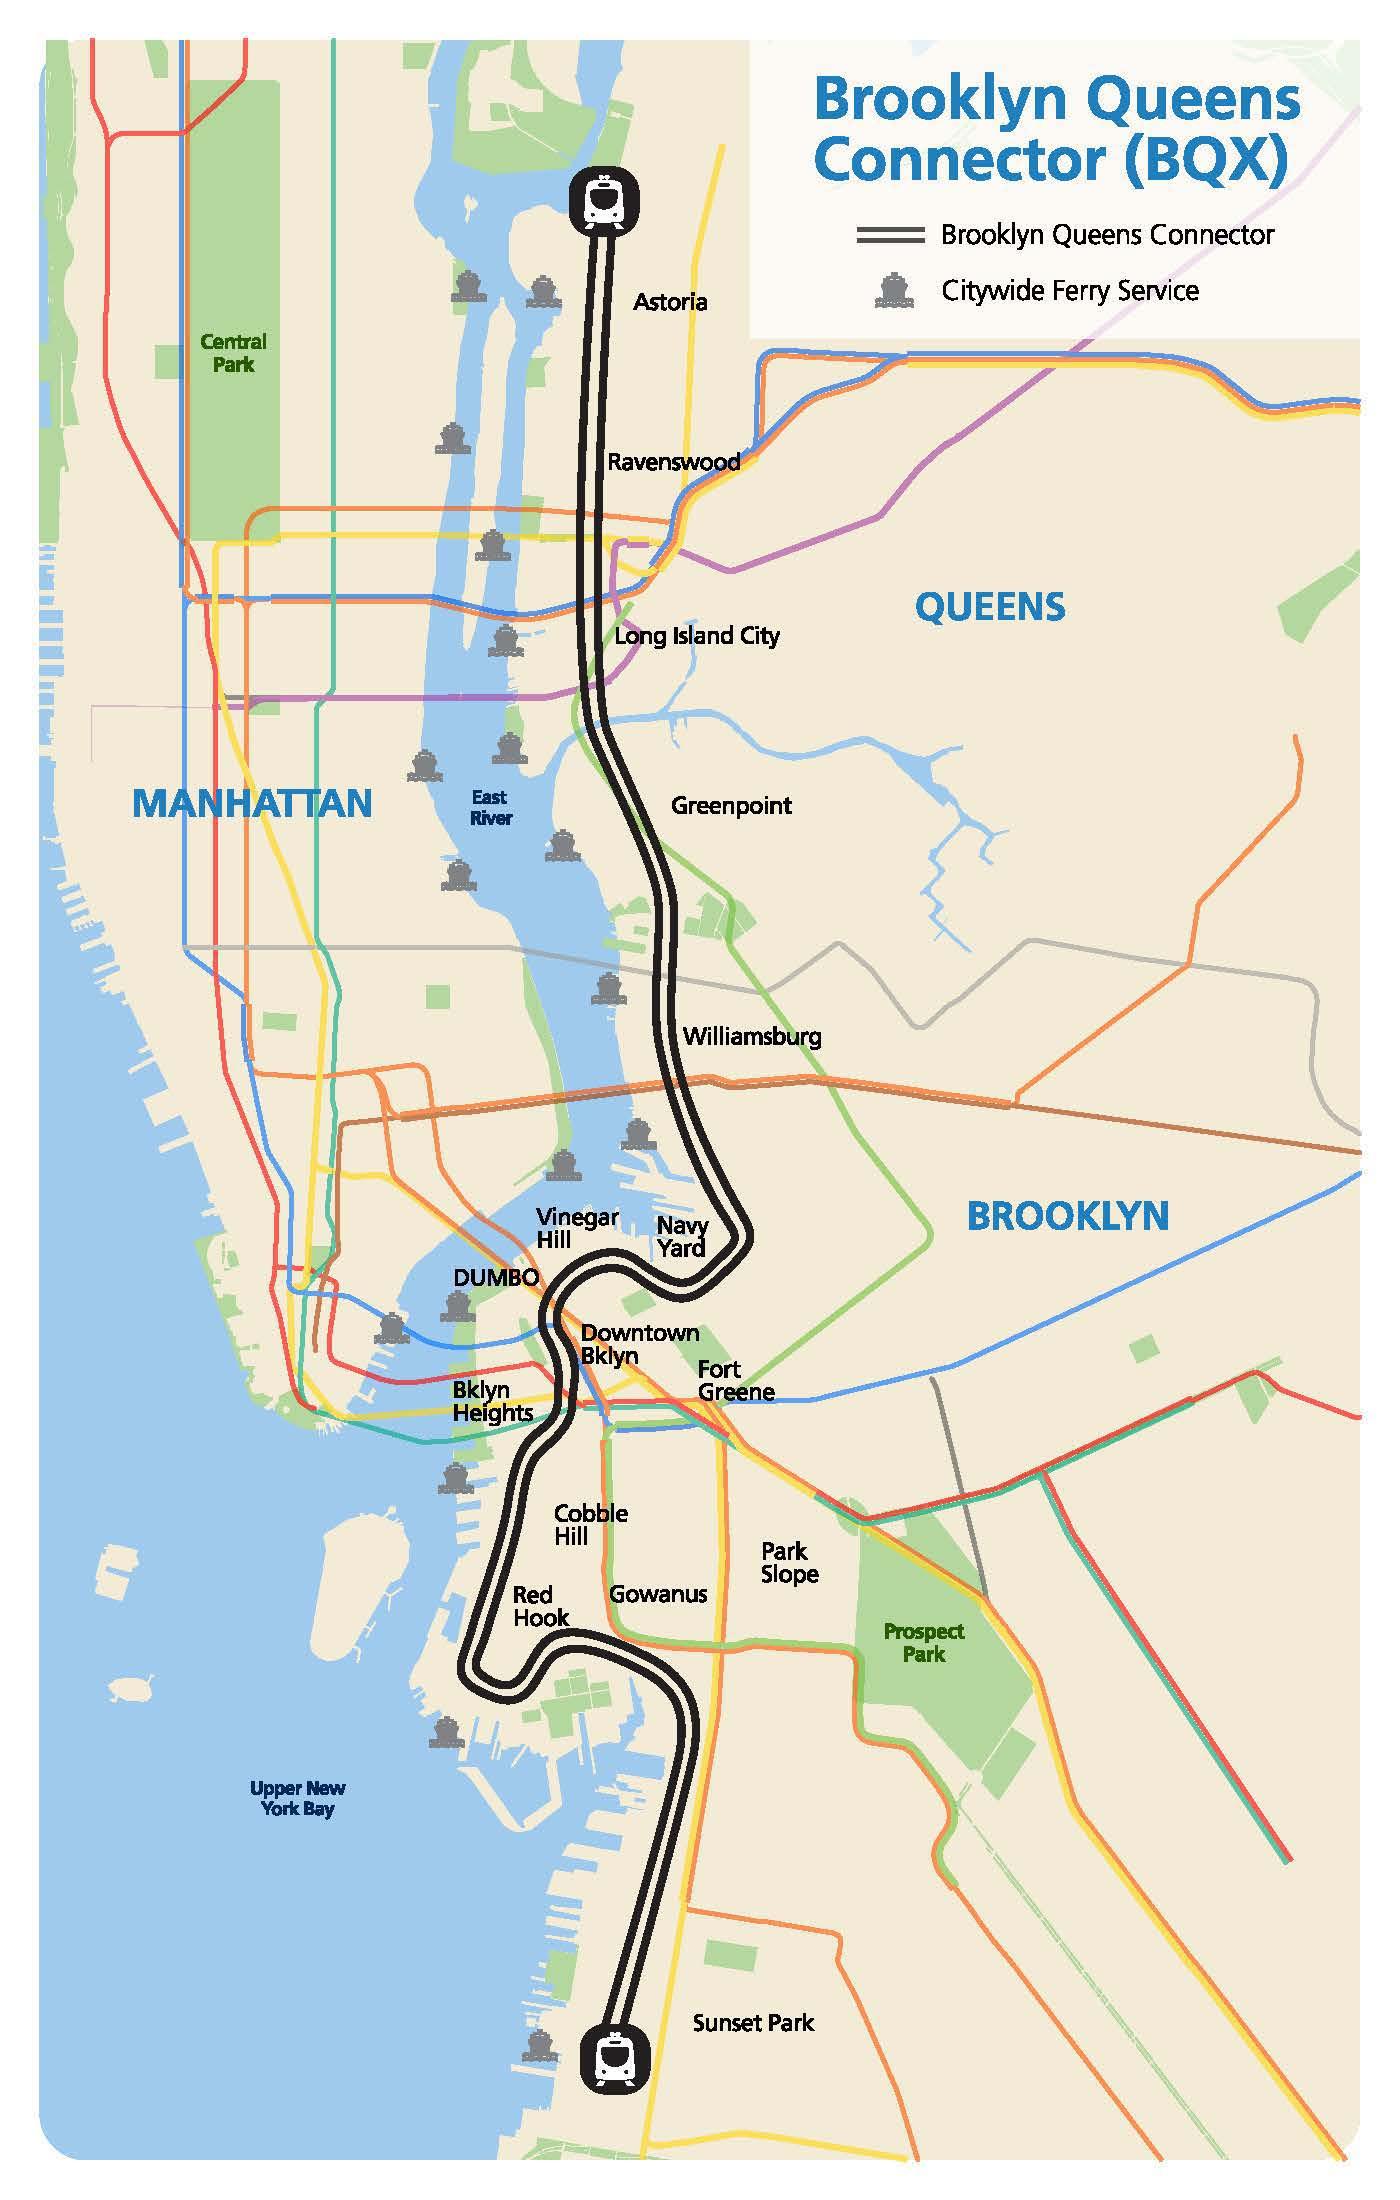 Source : New York City Economic Development Corporation/Fair Use